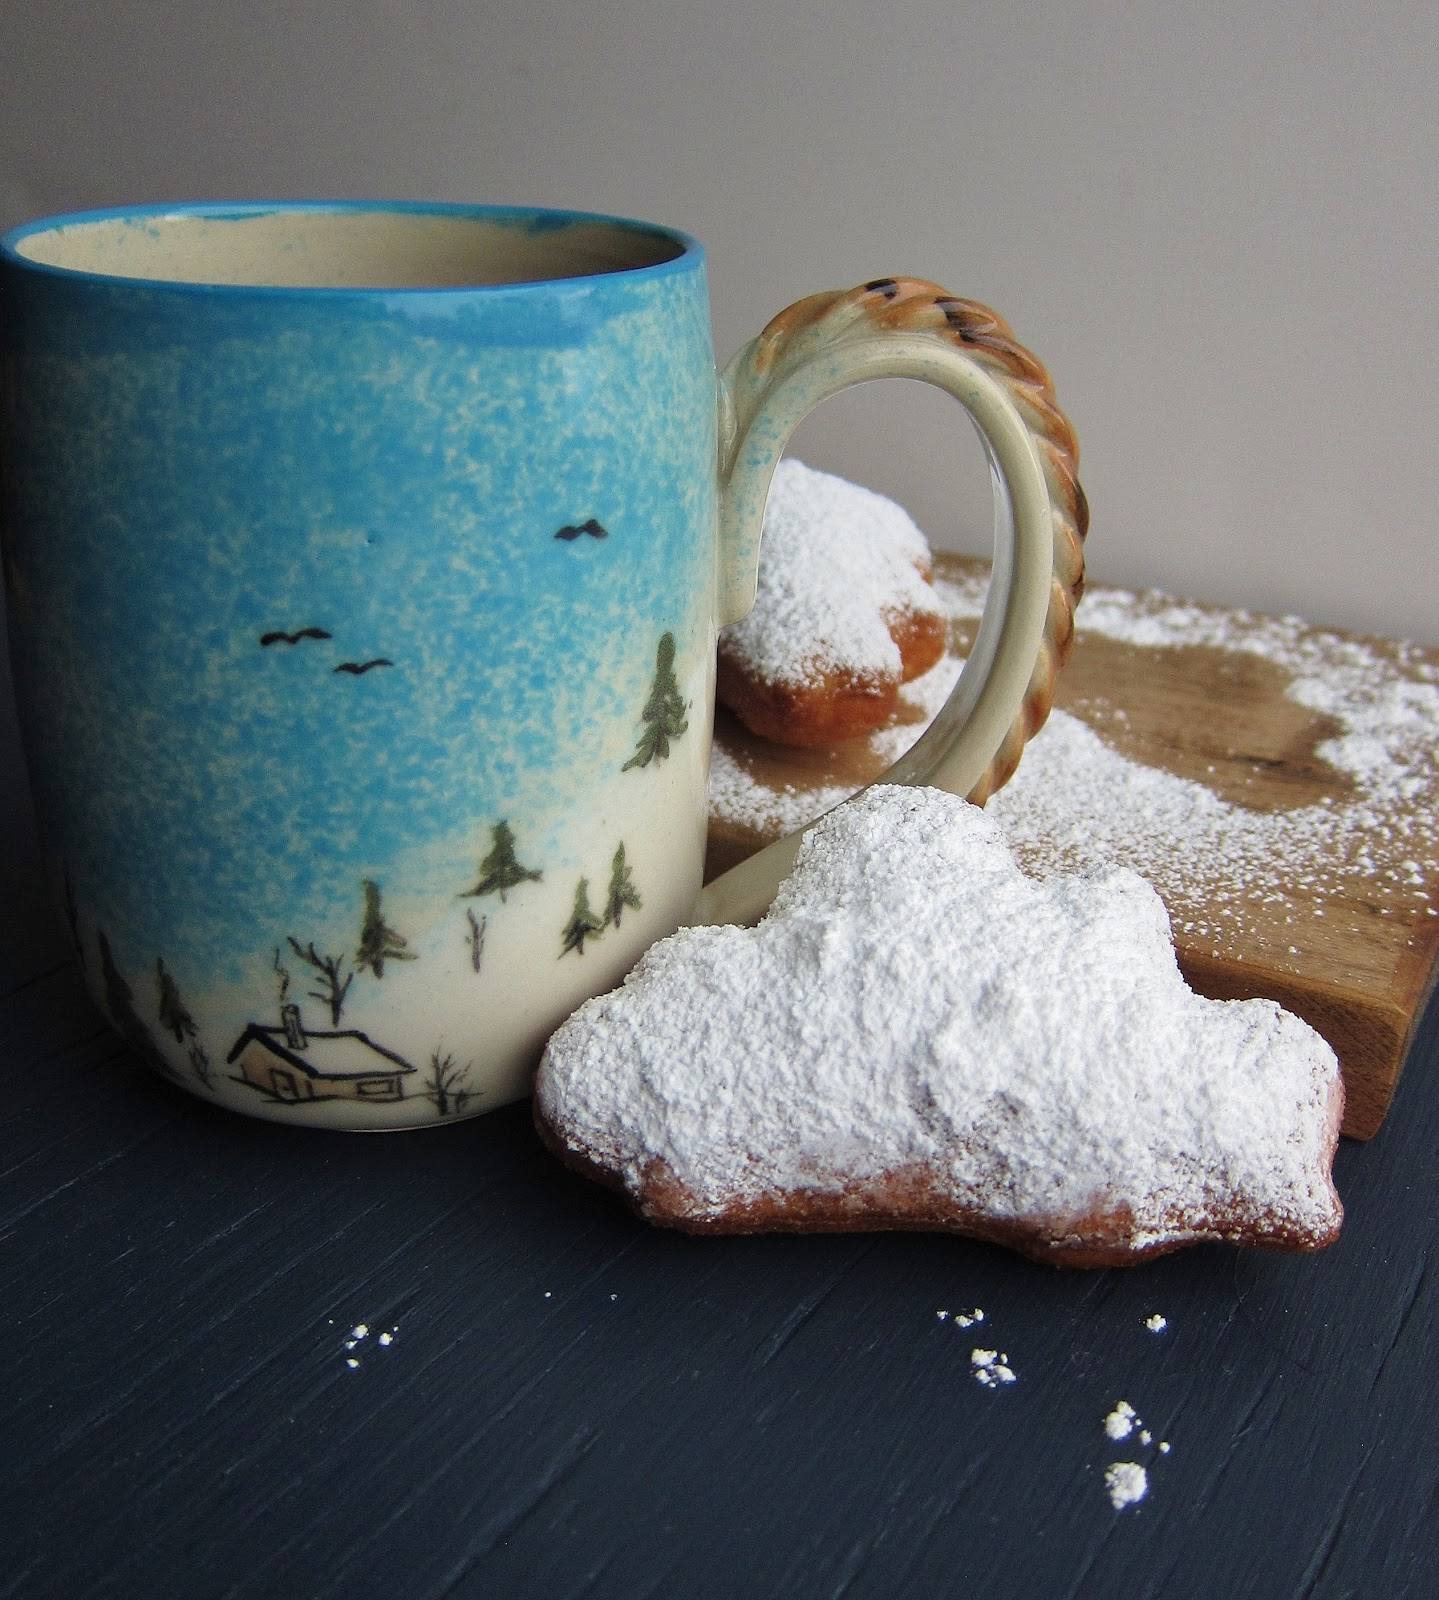 snow cloud buttermilk beignets